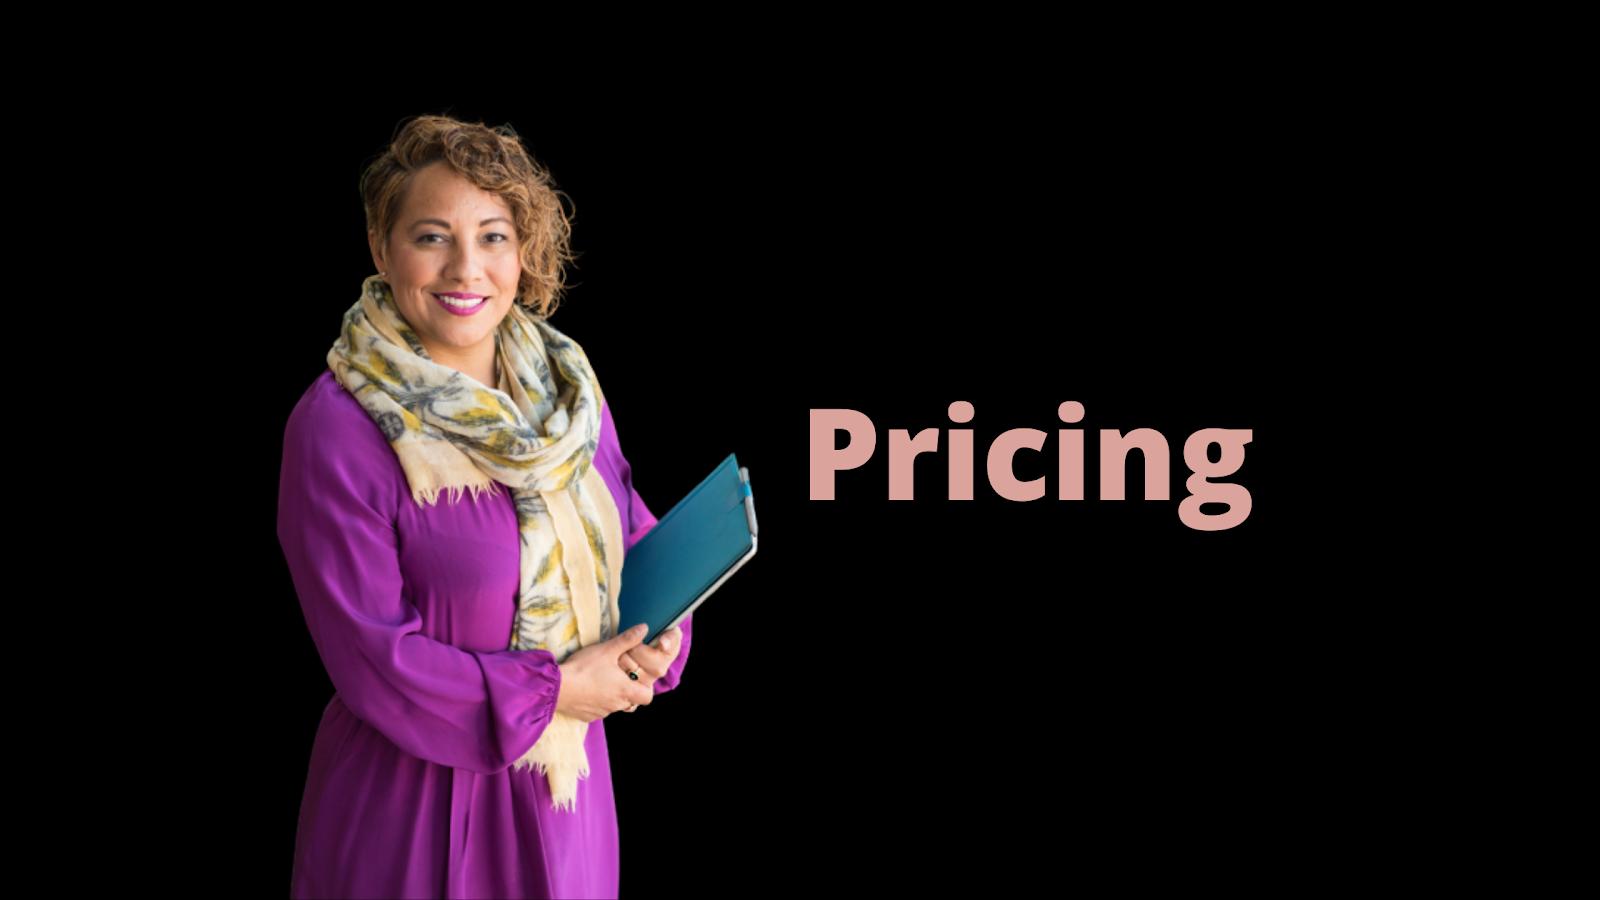 wix vs olitt: Pricing